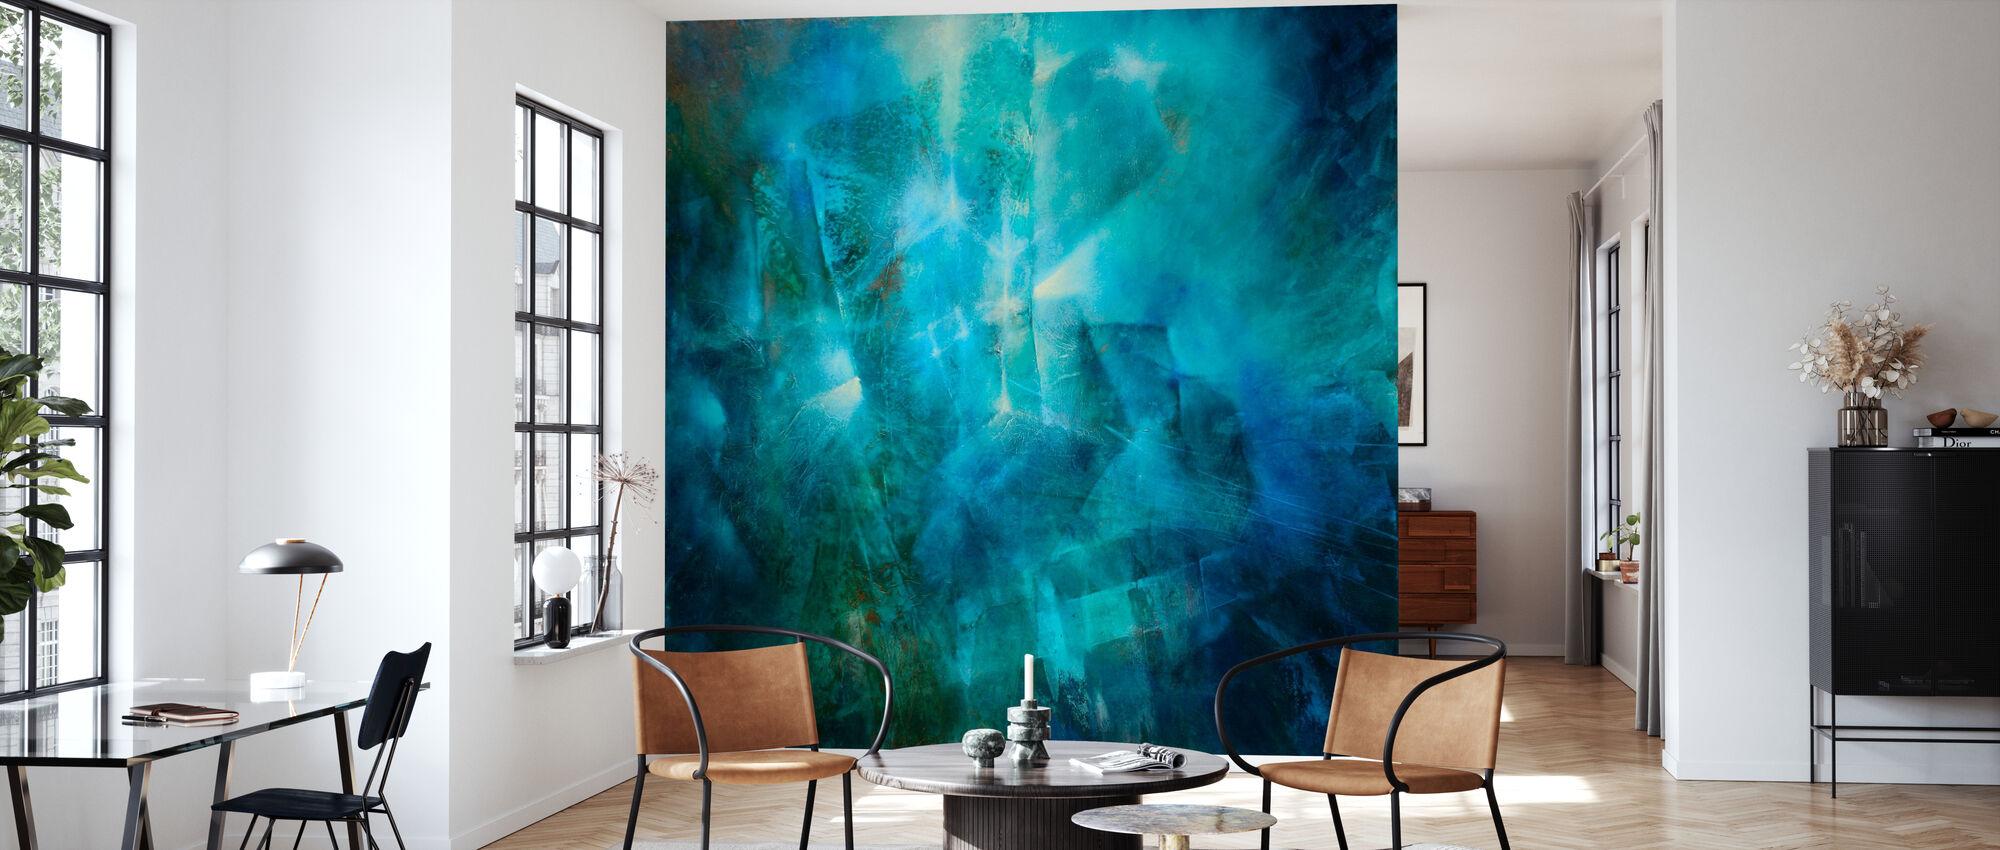 Emerald II - Wallpaper - Living Room